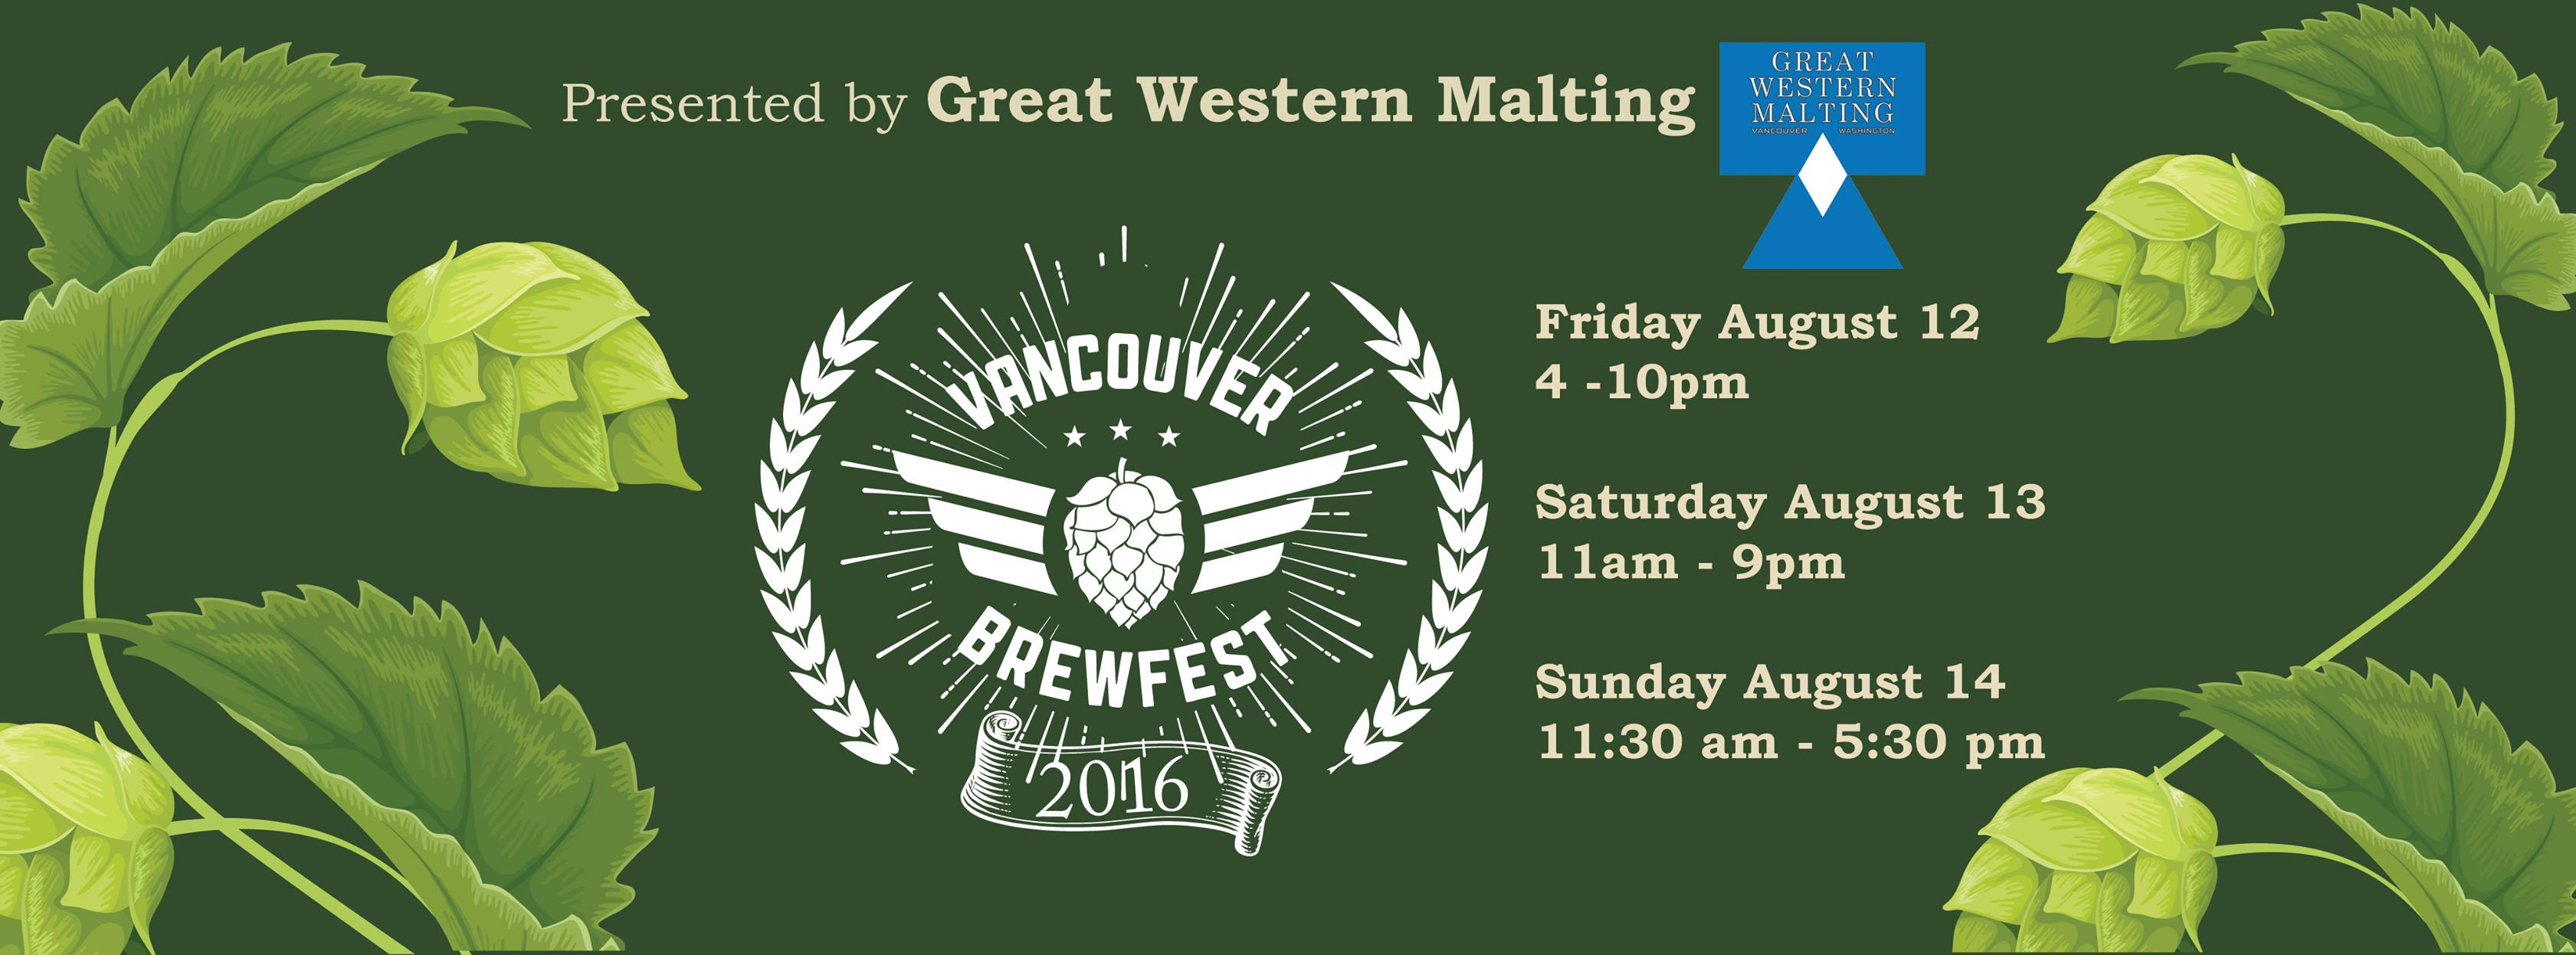 Vancouver Brewfest 2016 Summer